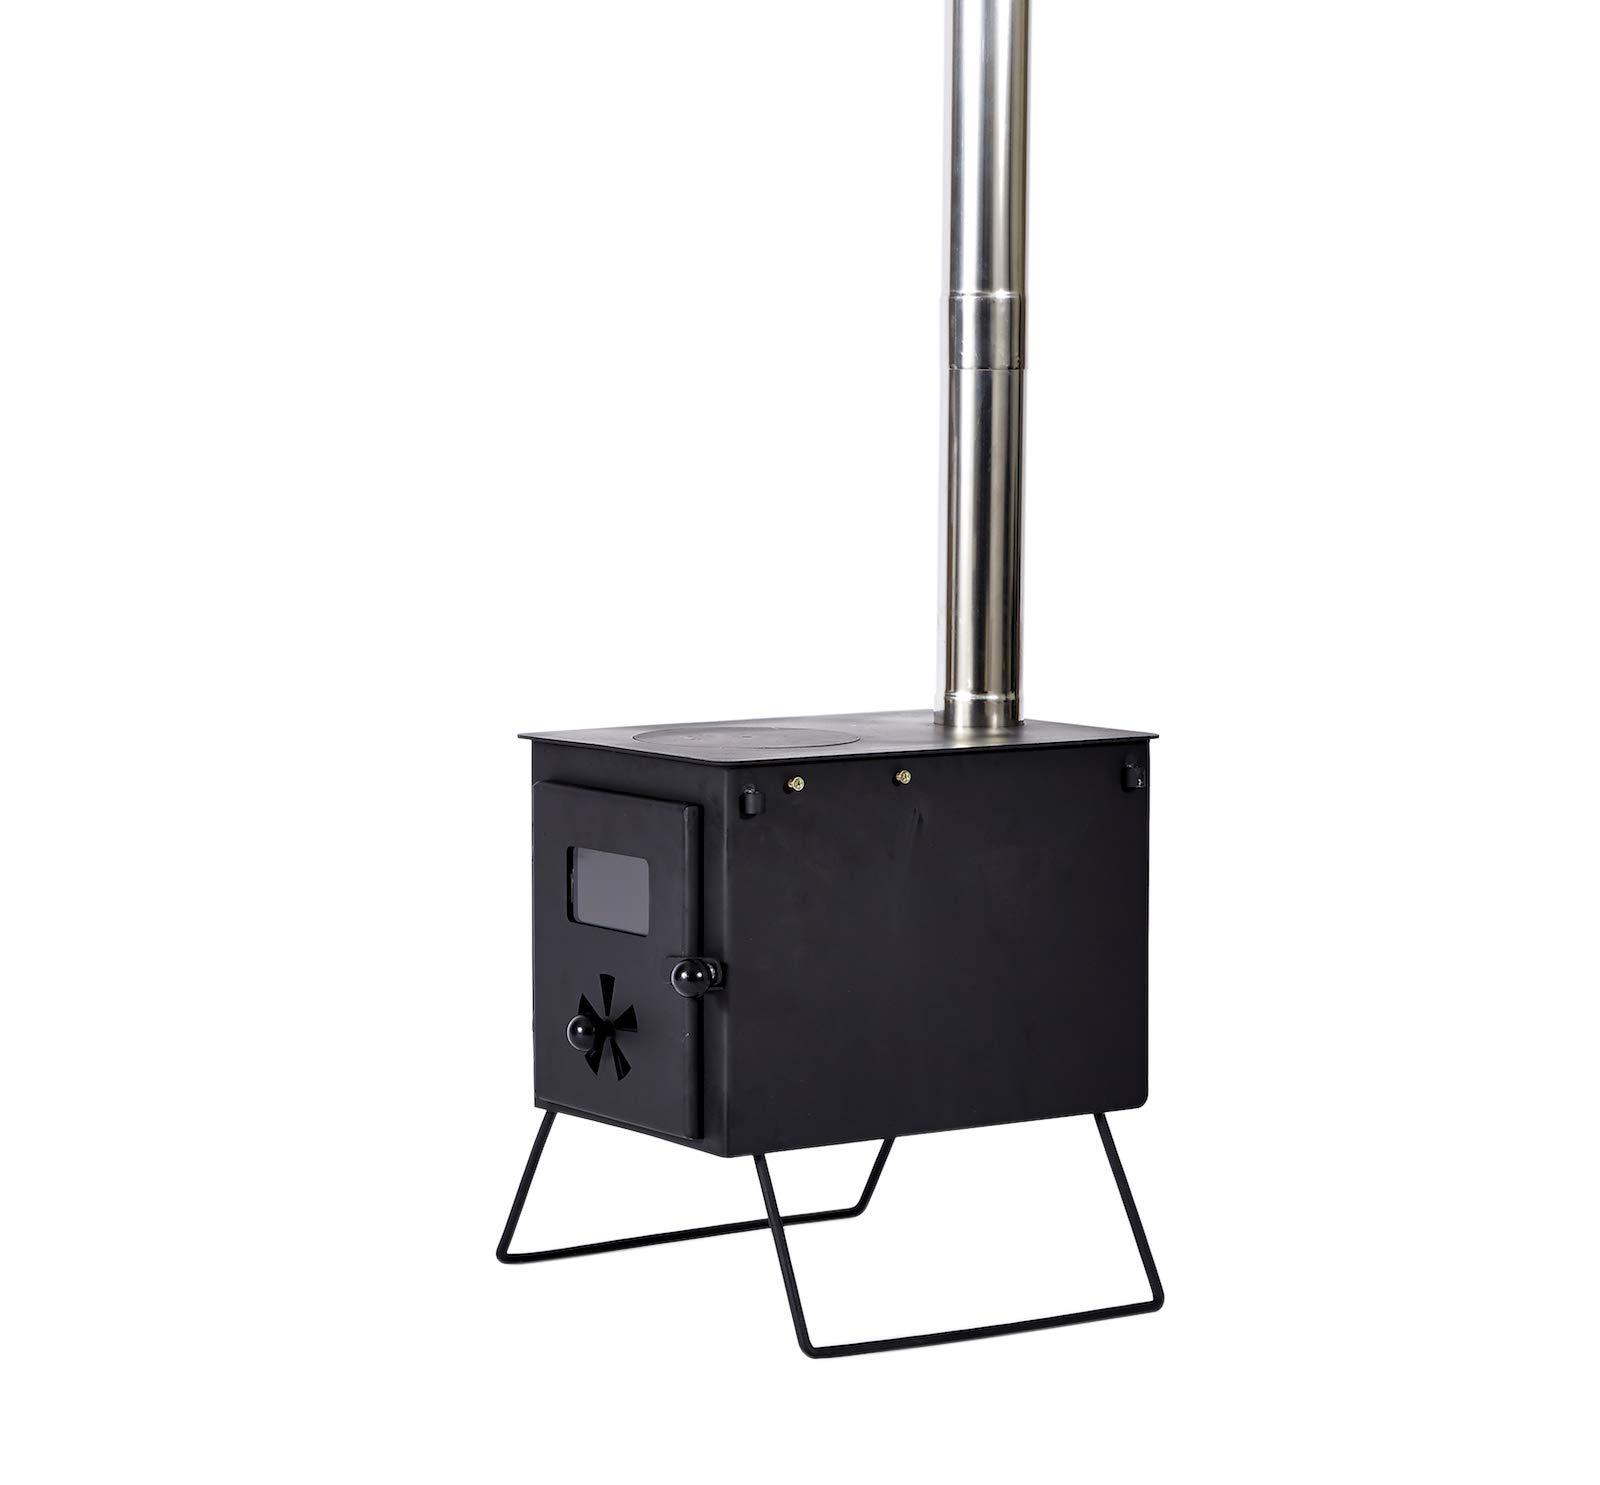 Outbacker 'Firebox' Portable Wood Burning Stove 7